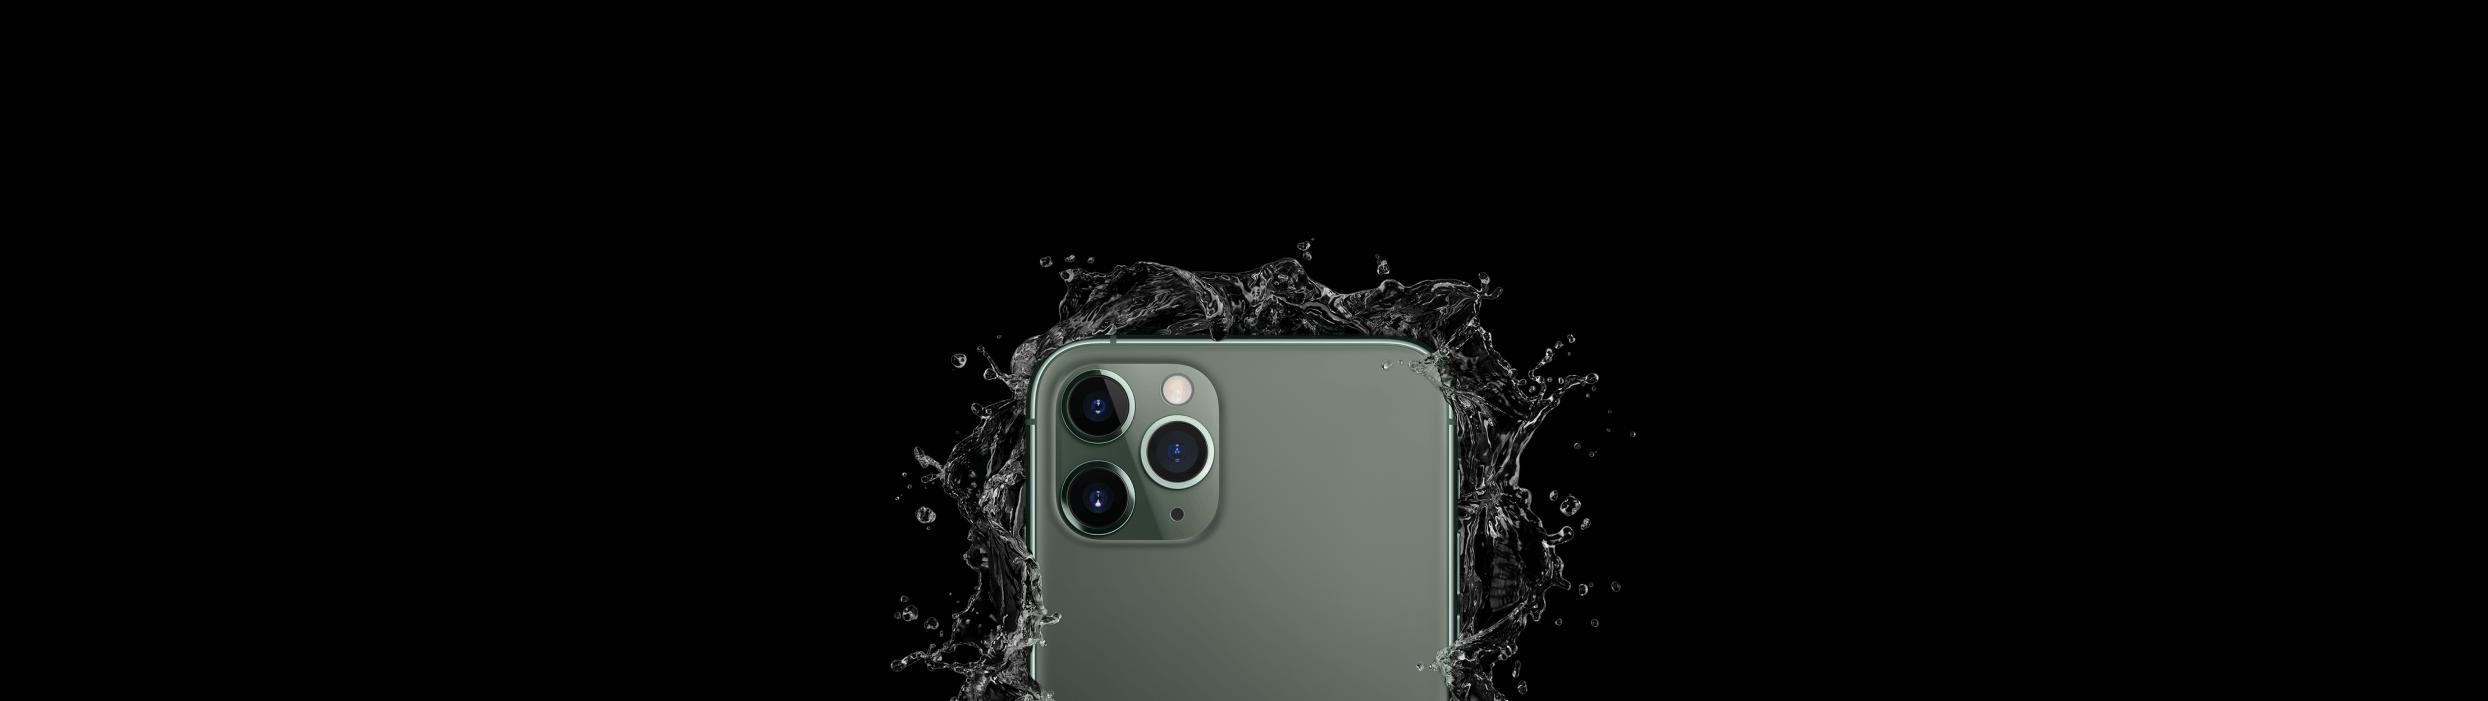 iPhone 11 Pro | Main